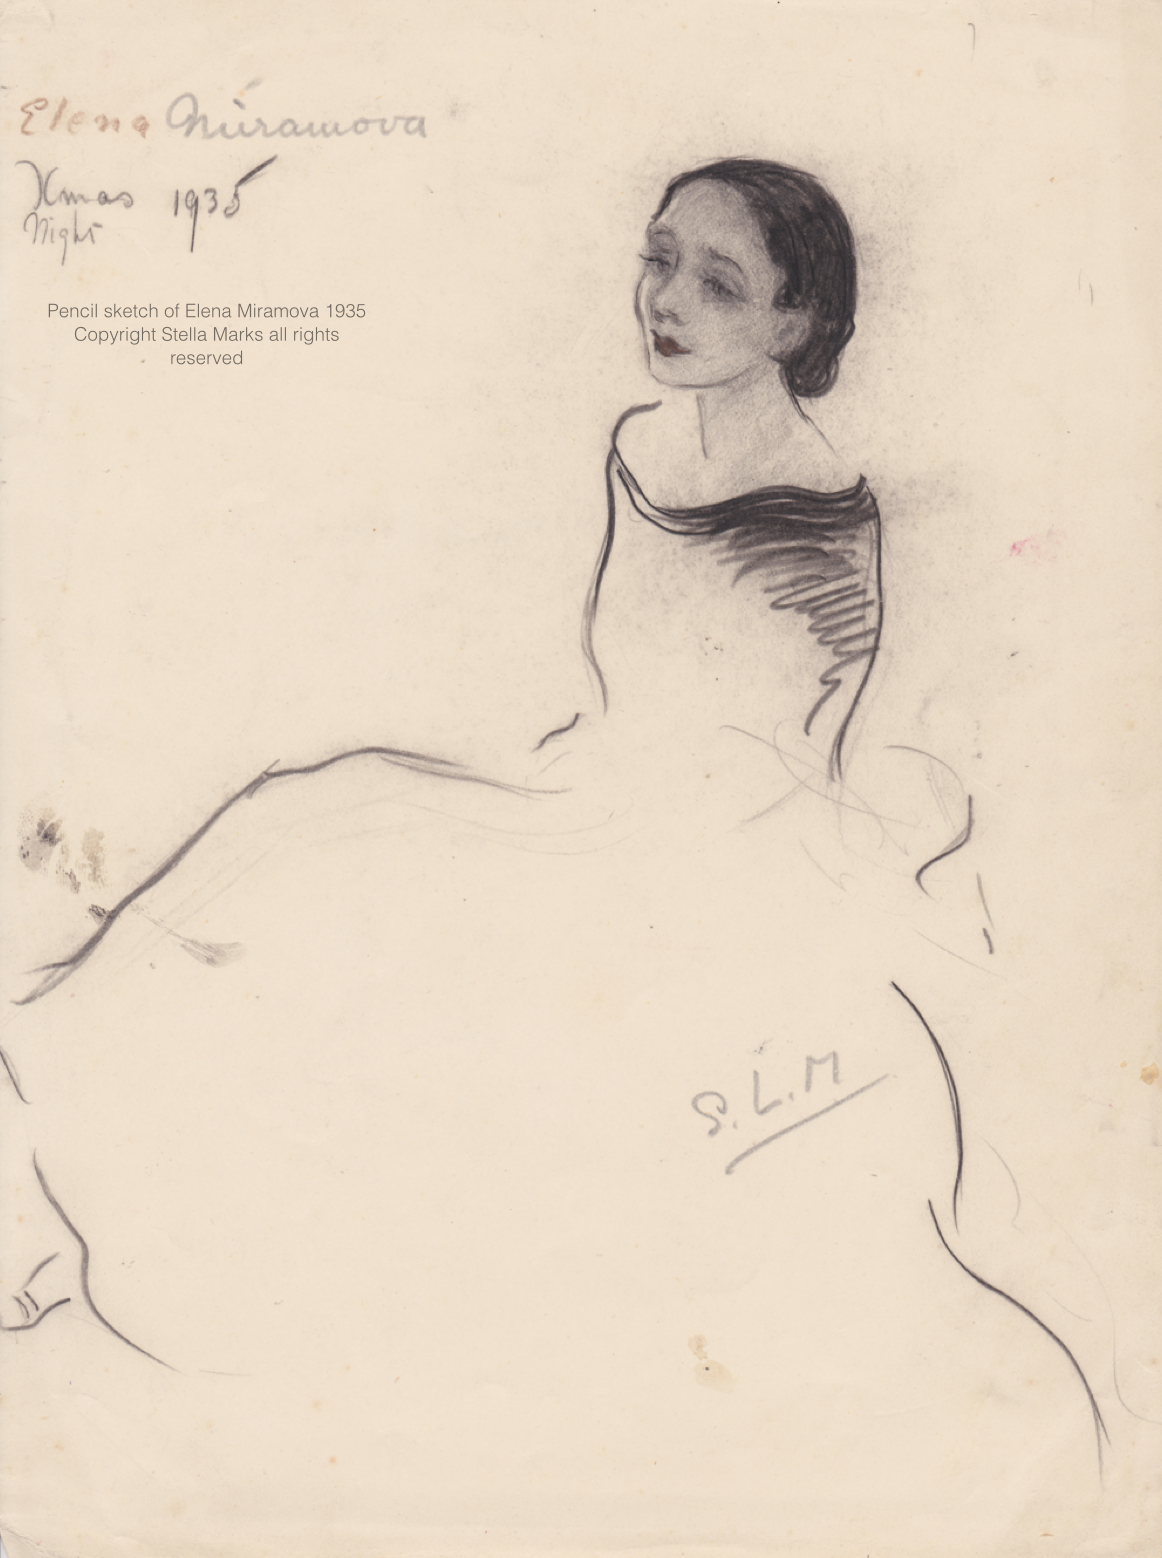 Stella Marks' pencil sketch of Elena MiRAmova 1935. CopyriGHT Stella Marks Estate. All Rights Reserved. Private Collection.